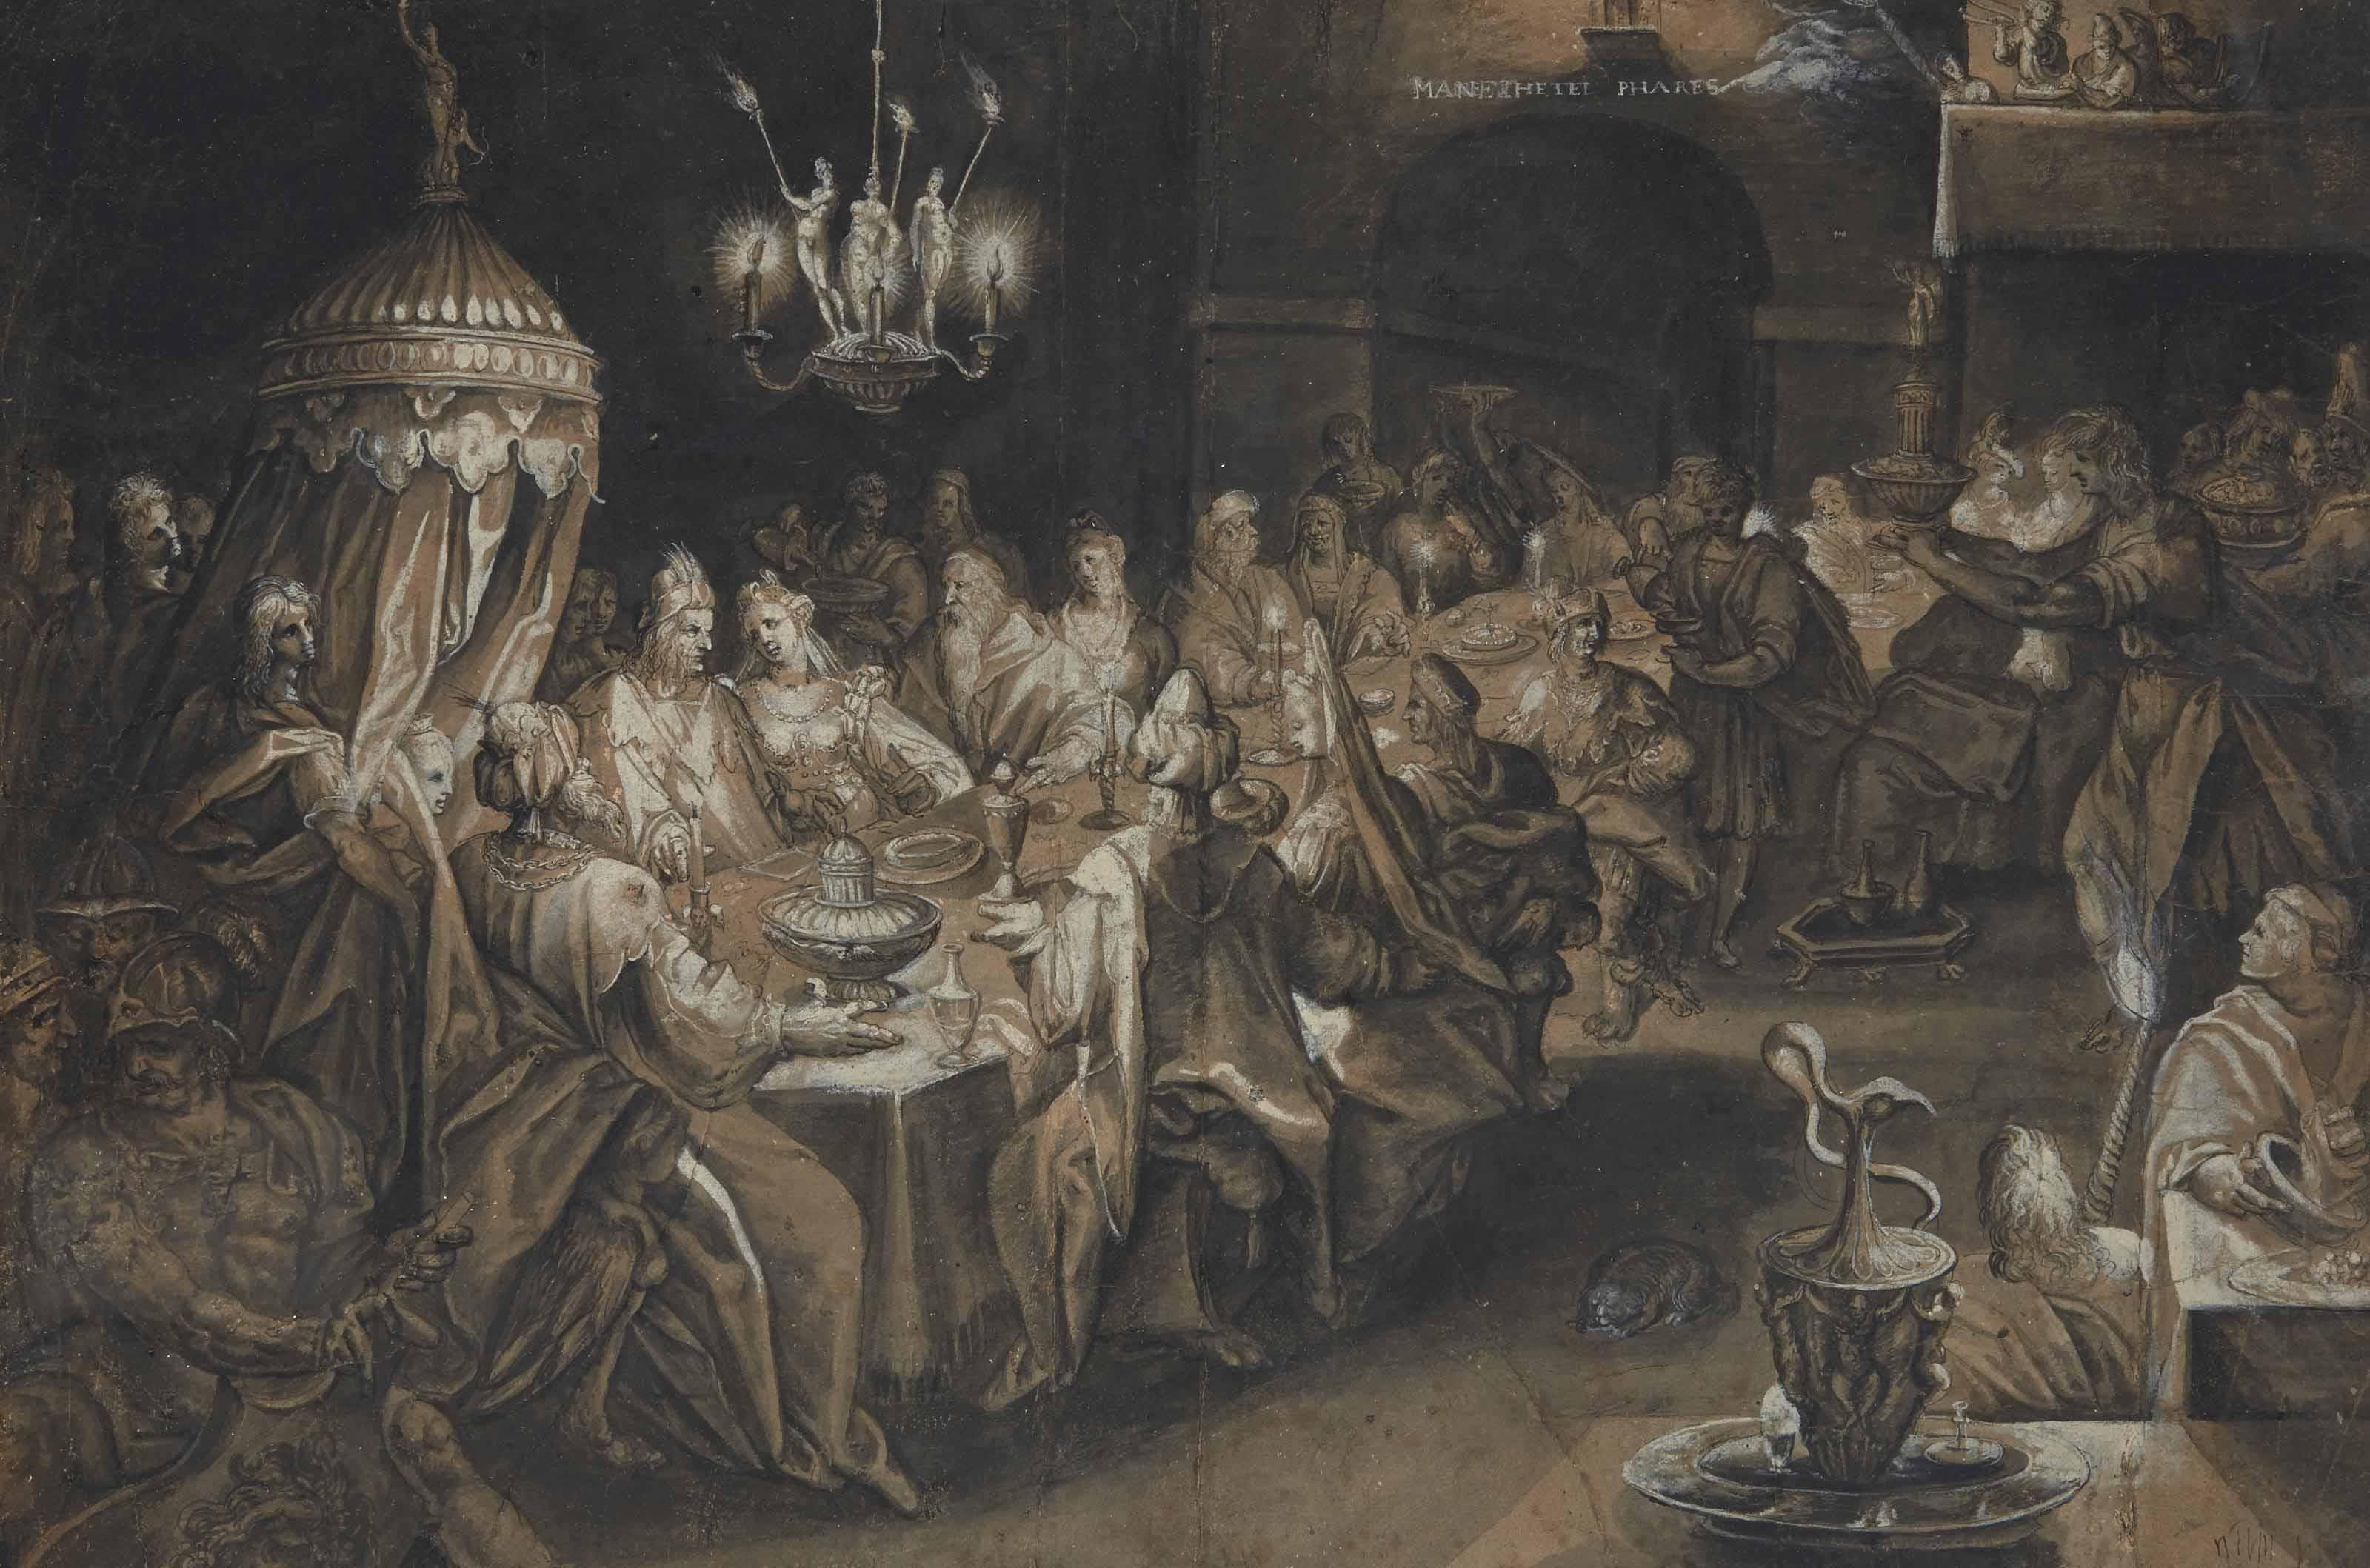 Le festin de Balthazar, d'après Jan Harmensz Müller